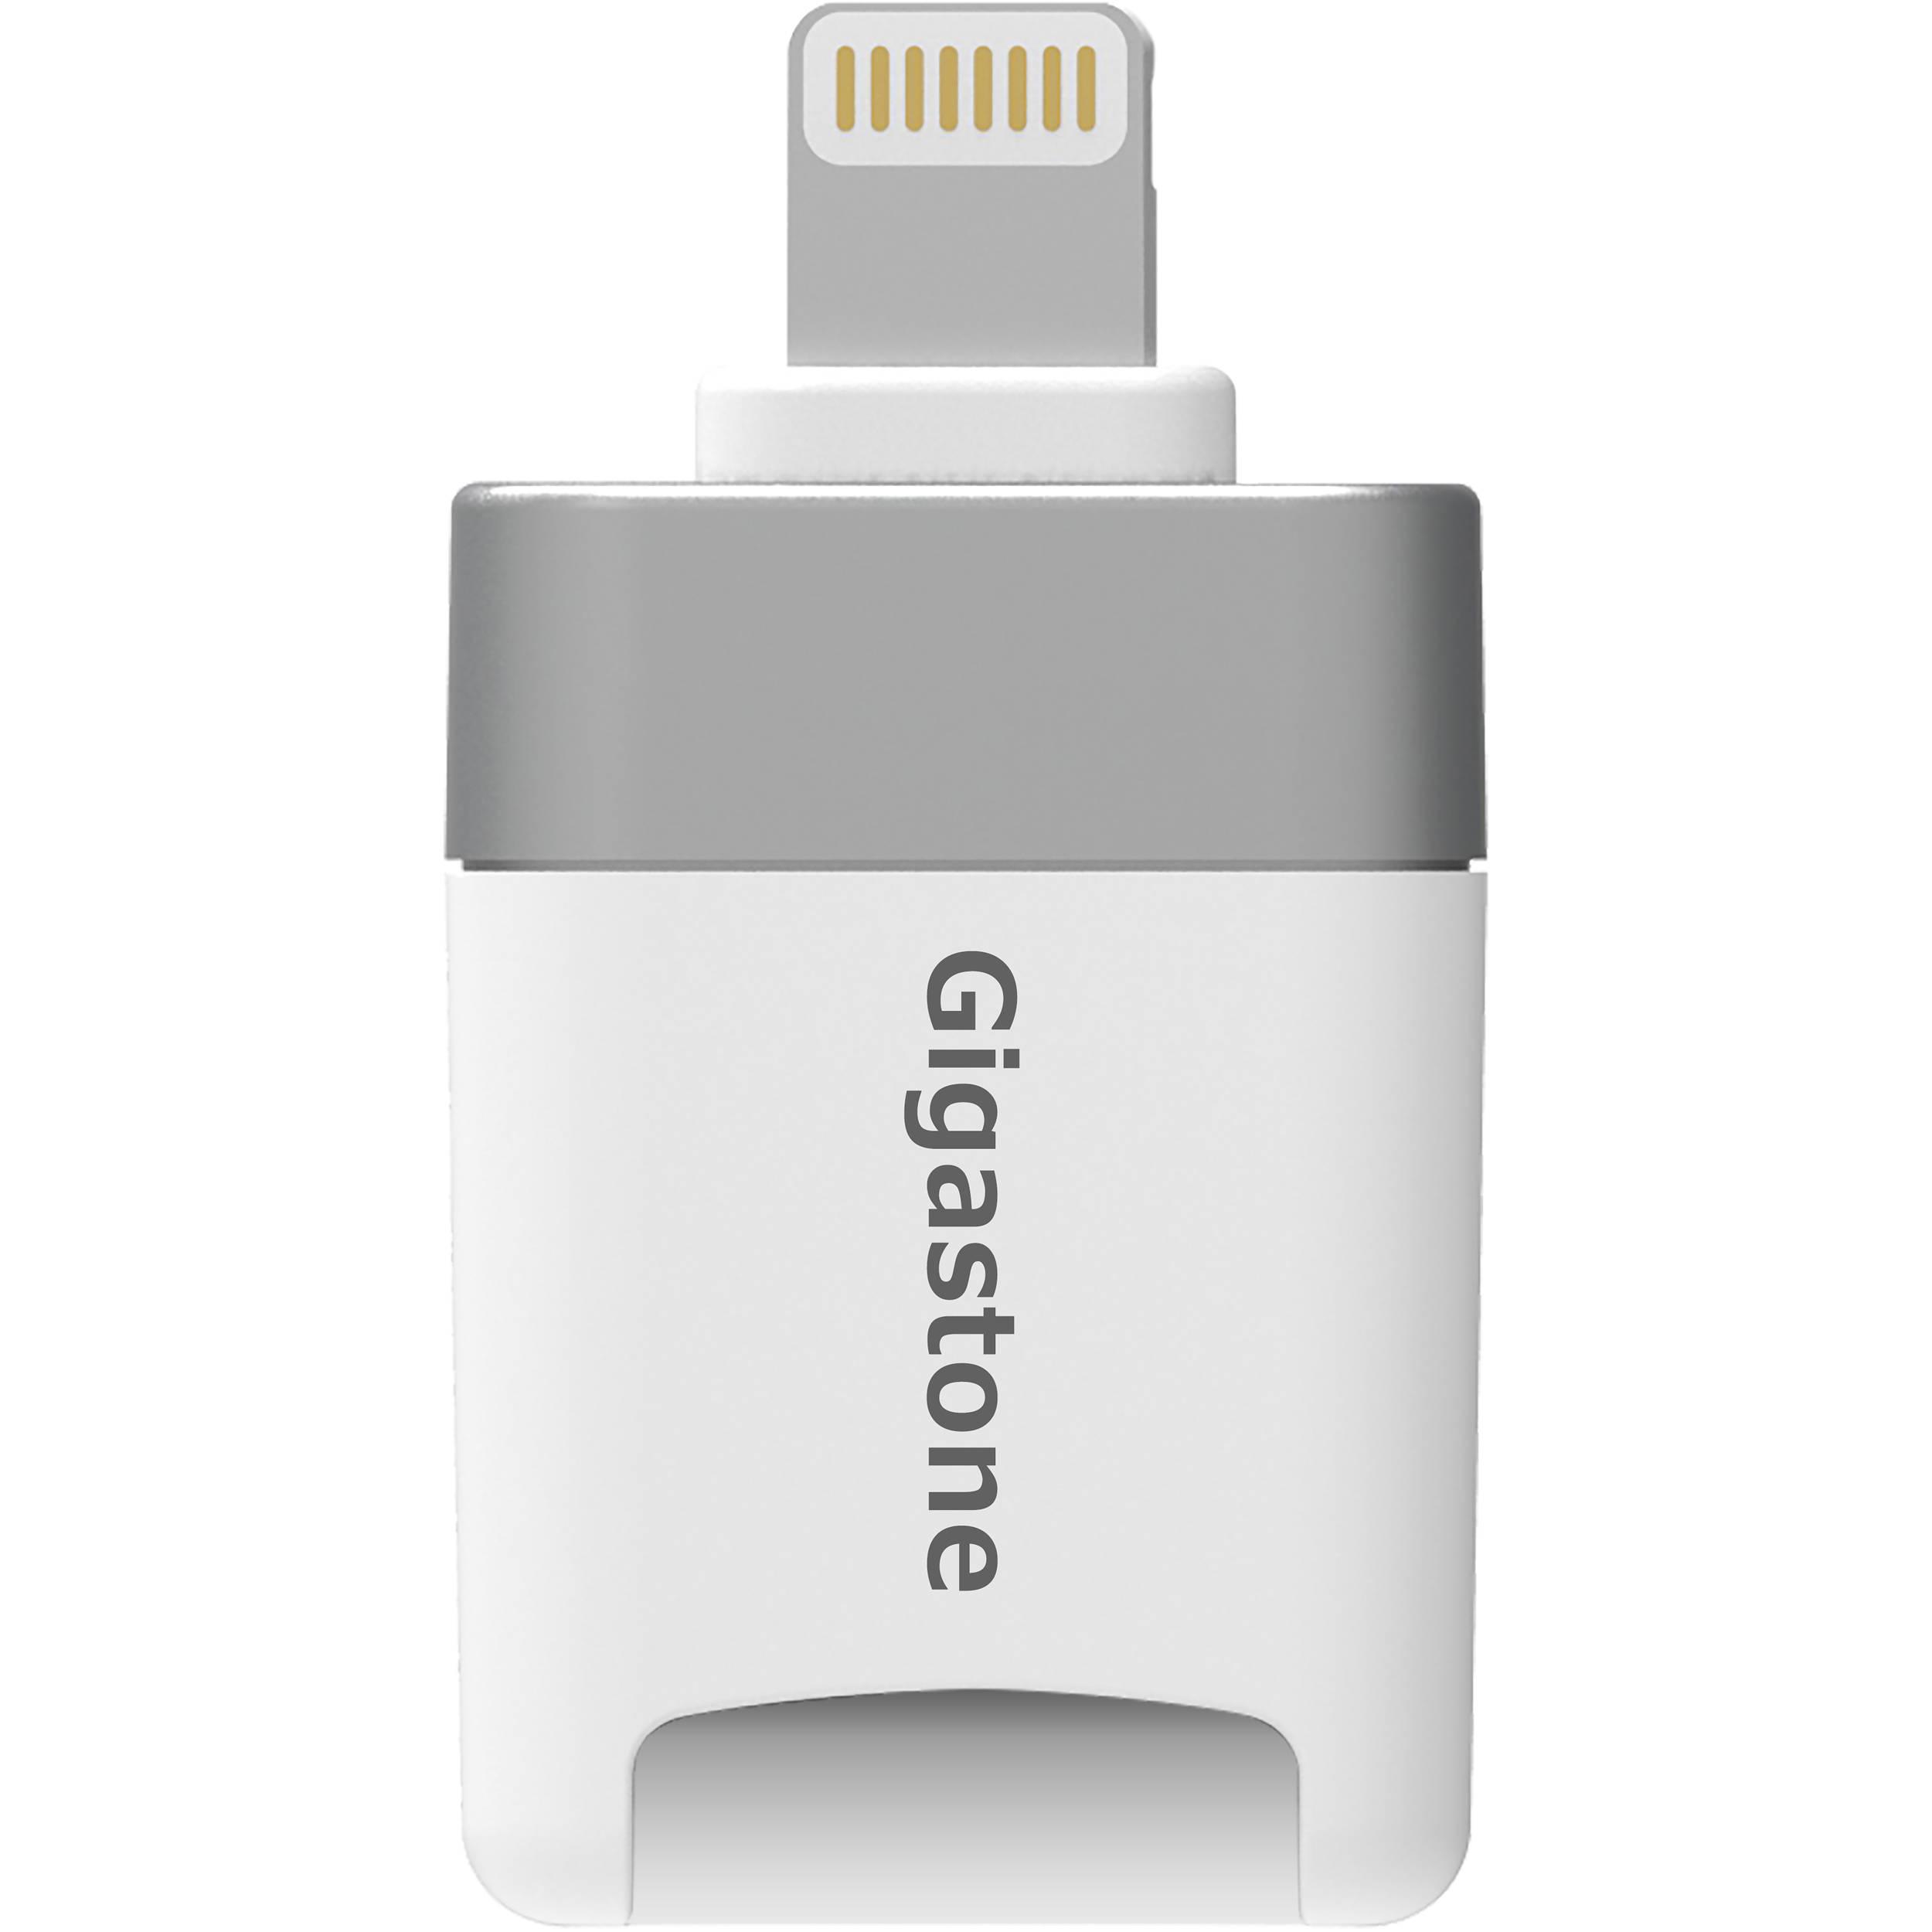 Mini Sd Kartenleser.Gigastone Cr8600 Ios Microsd Card Reader